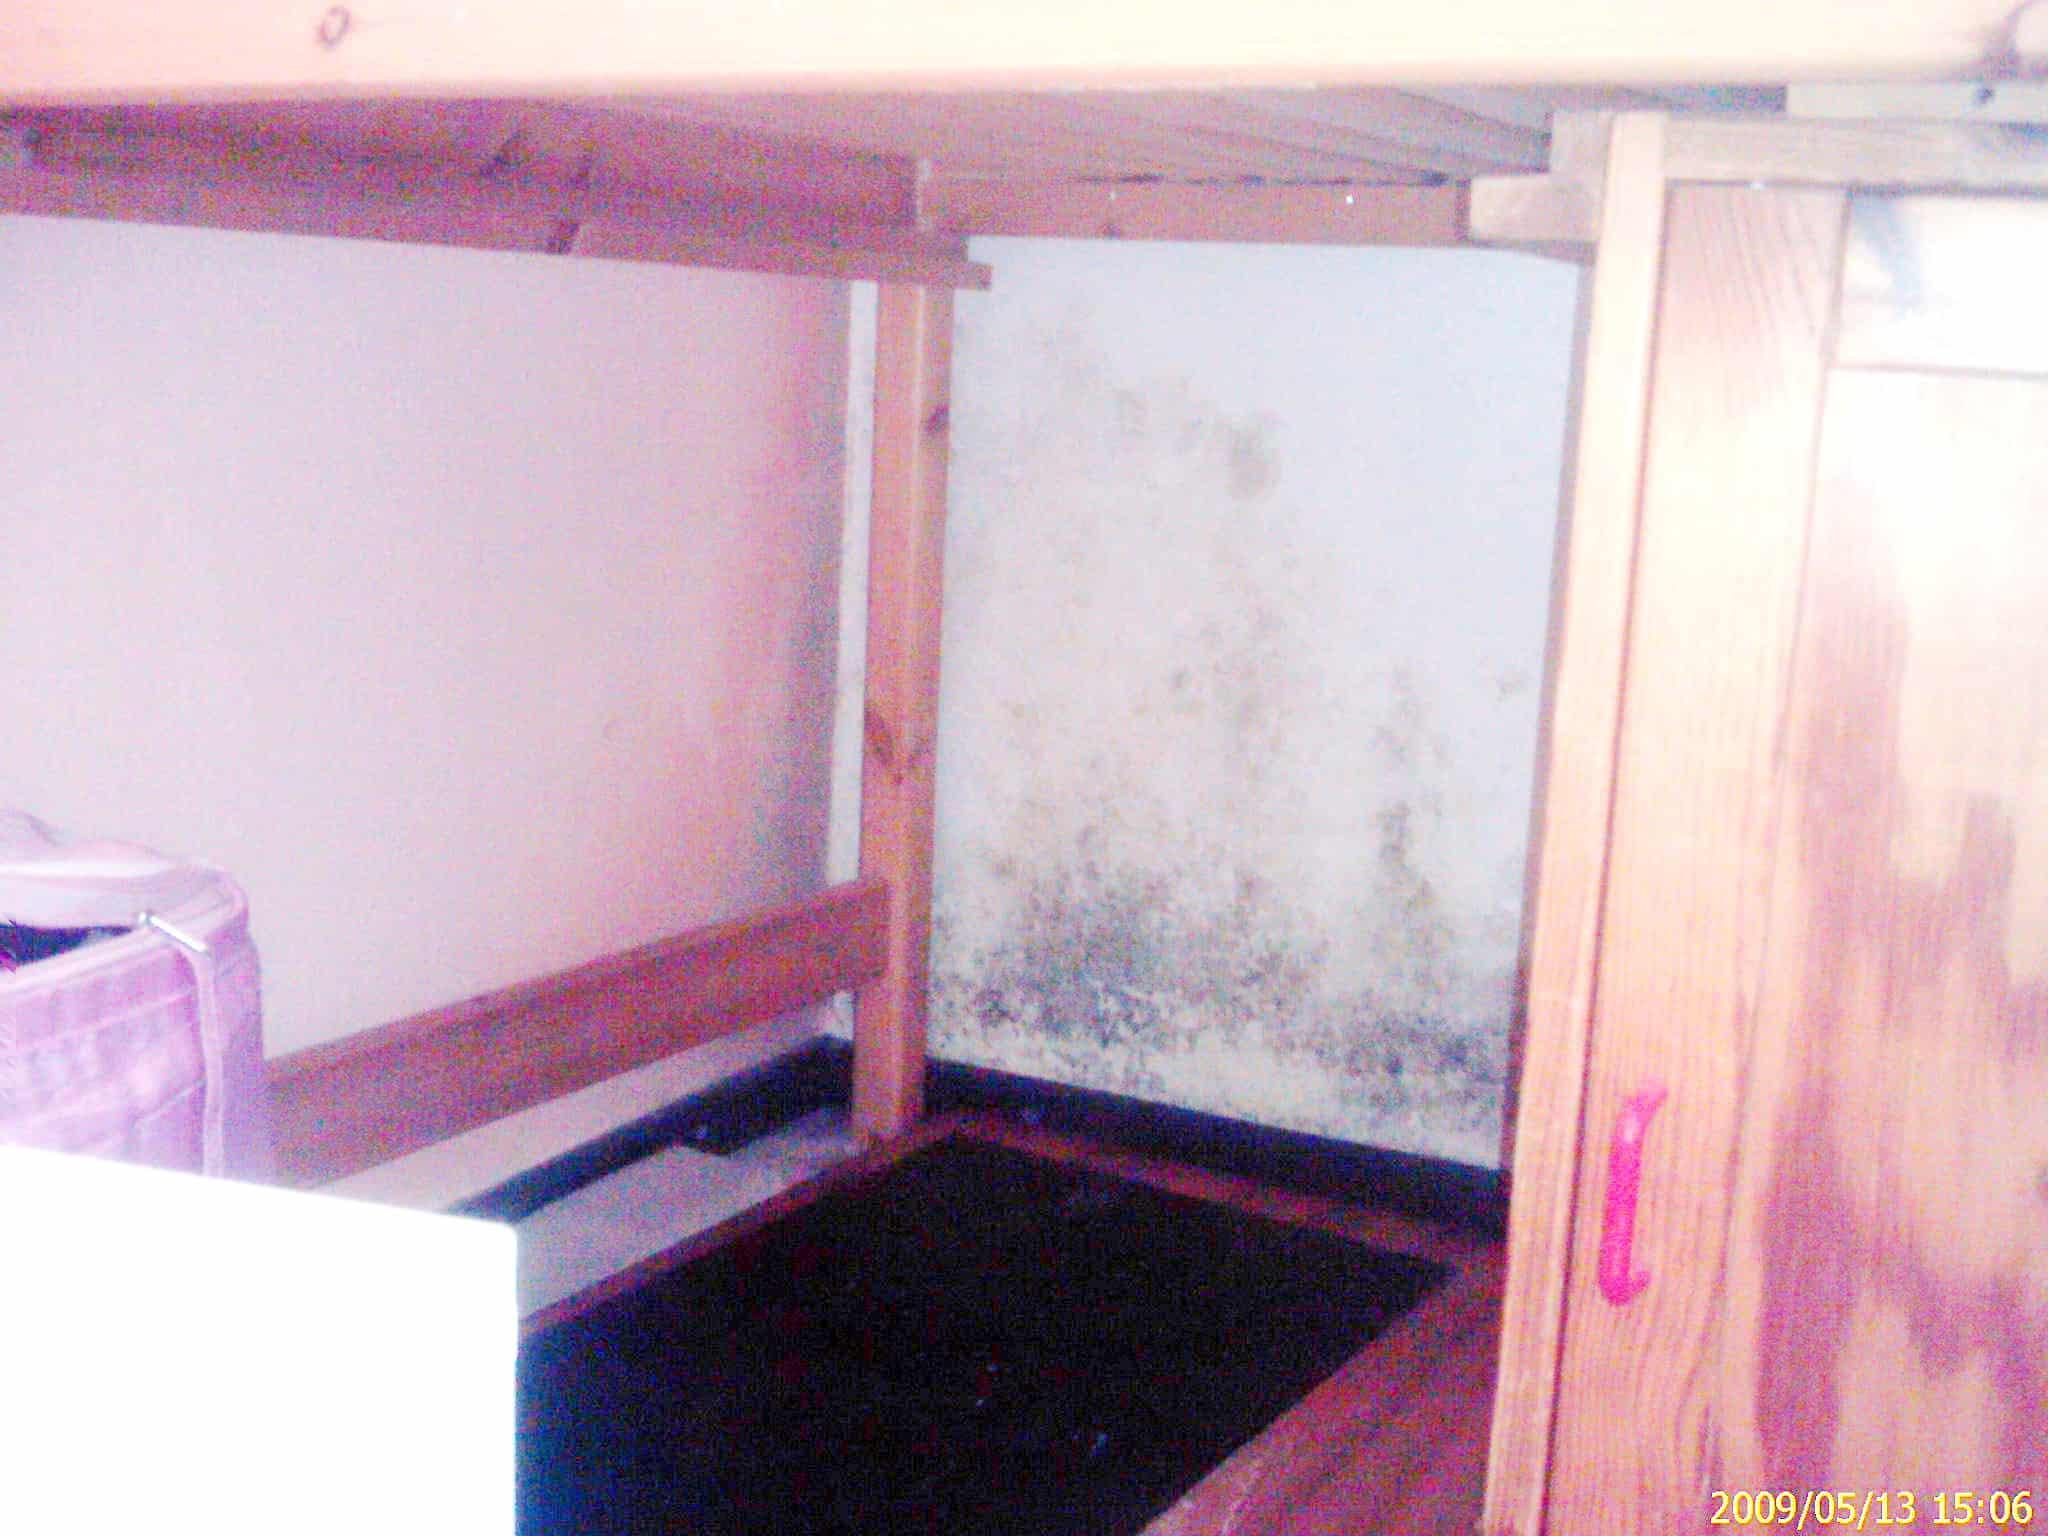 Schimmel Wohnung Entfernen schimmel wohnung überall schimmelbefall baugutachter